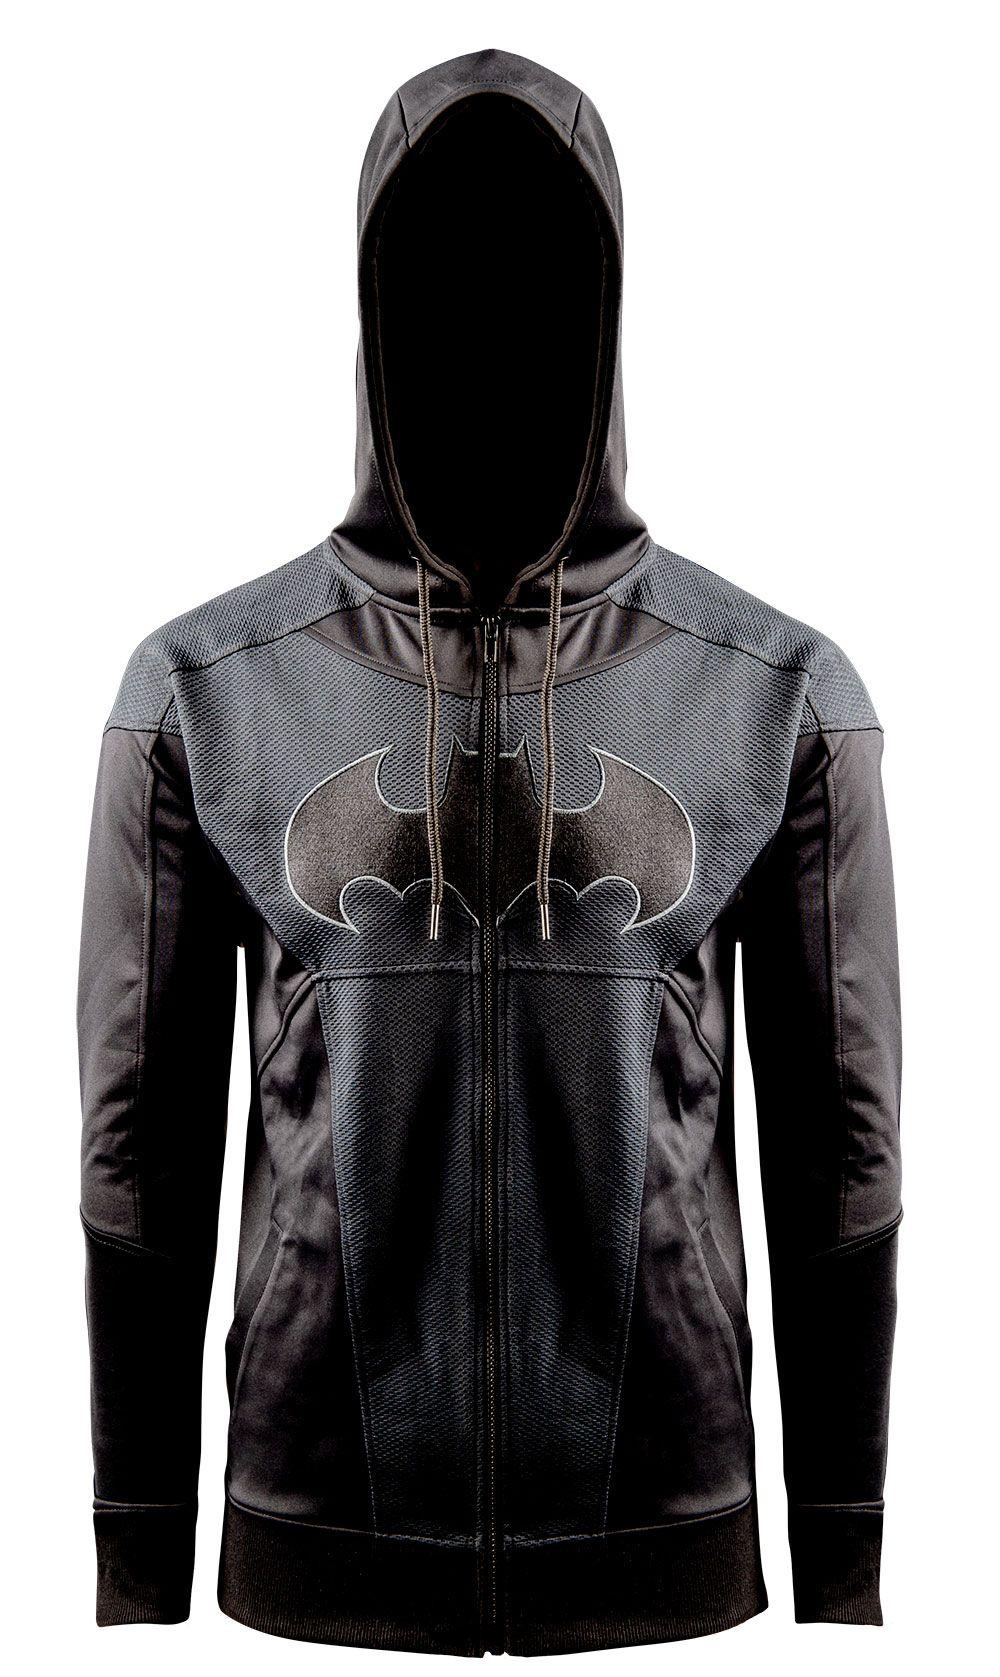 Batman 'Bat in Black' Limited Edition Premium Hoodie